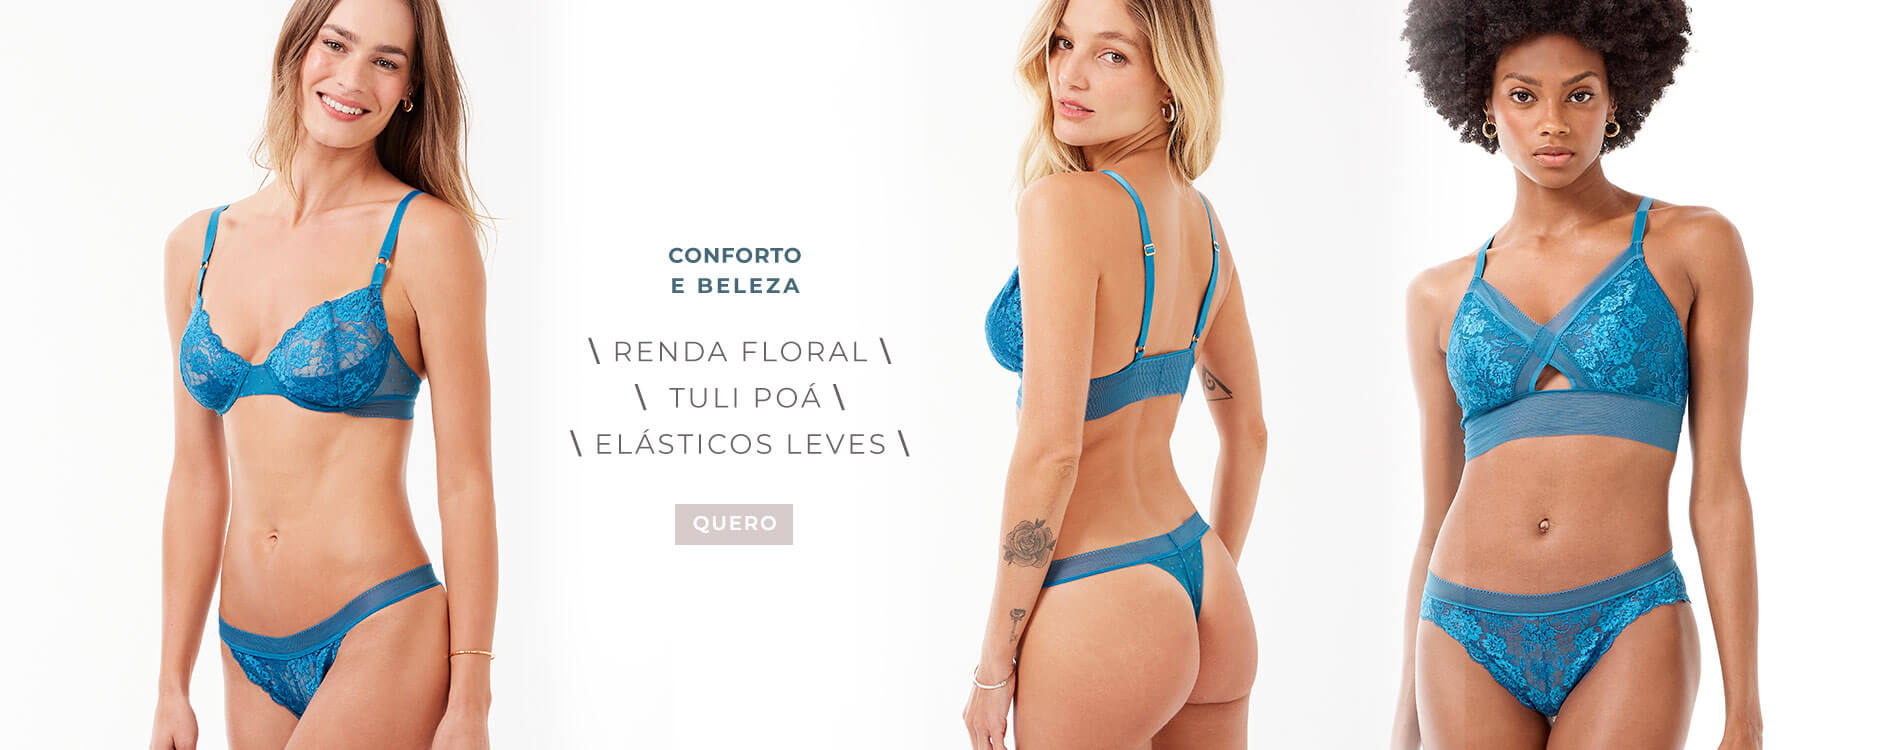 Sofia new in modelos - trackEcommerce